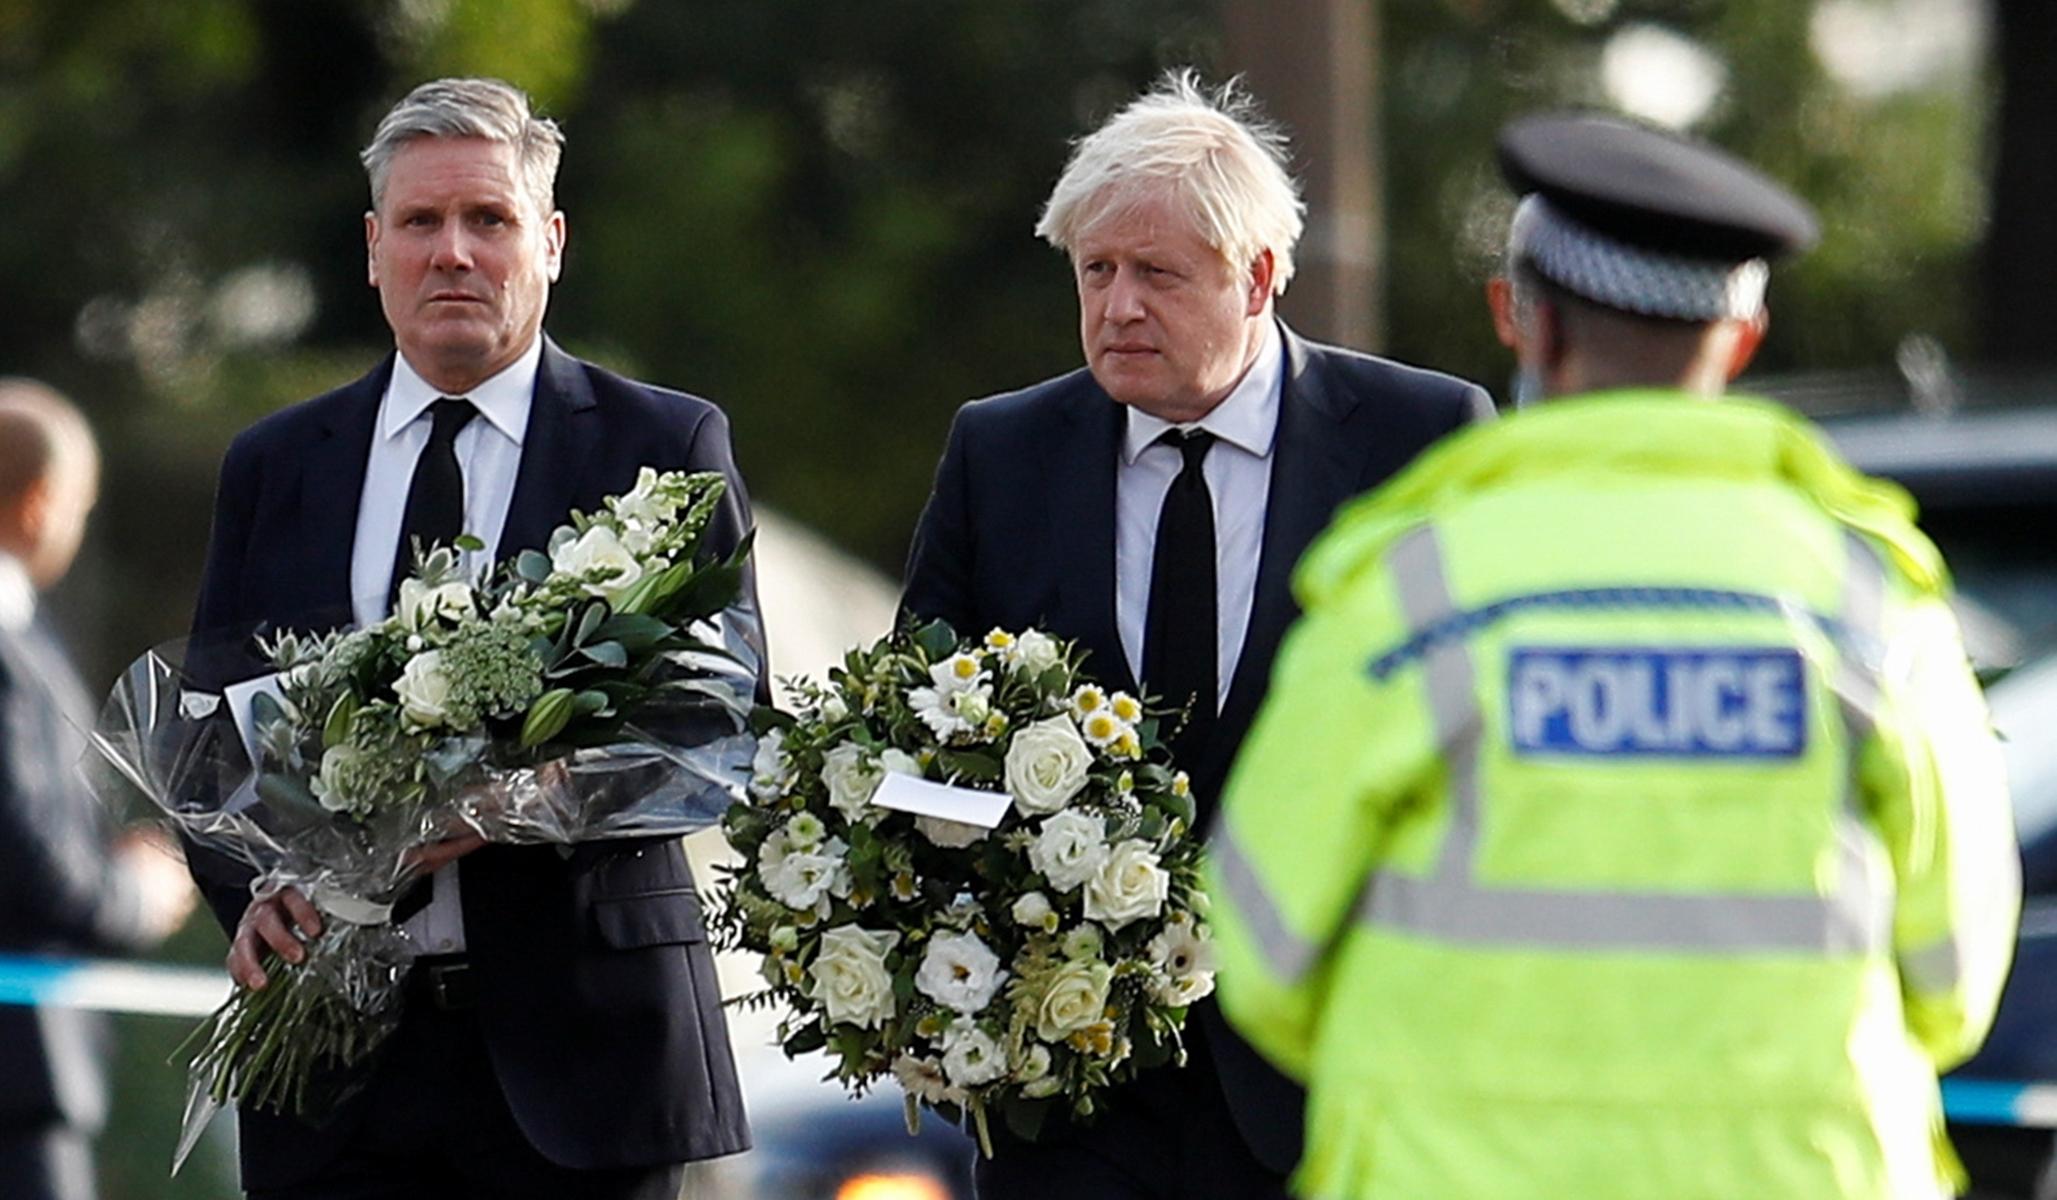 British Police Label Fatal Stabbing of Lawmaker 'Terrorist Incident'